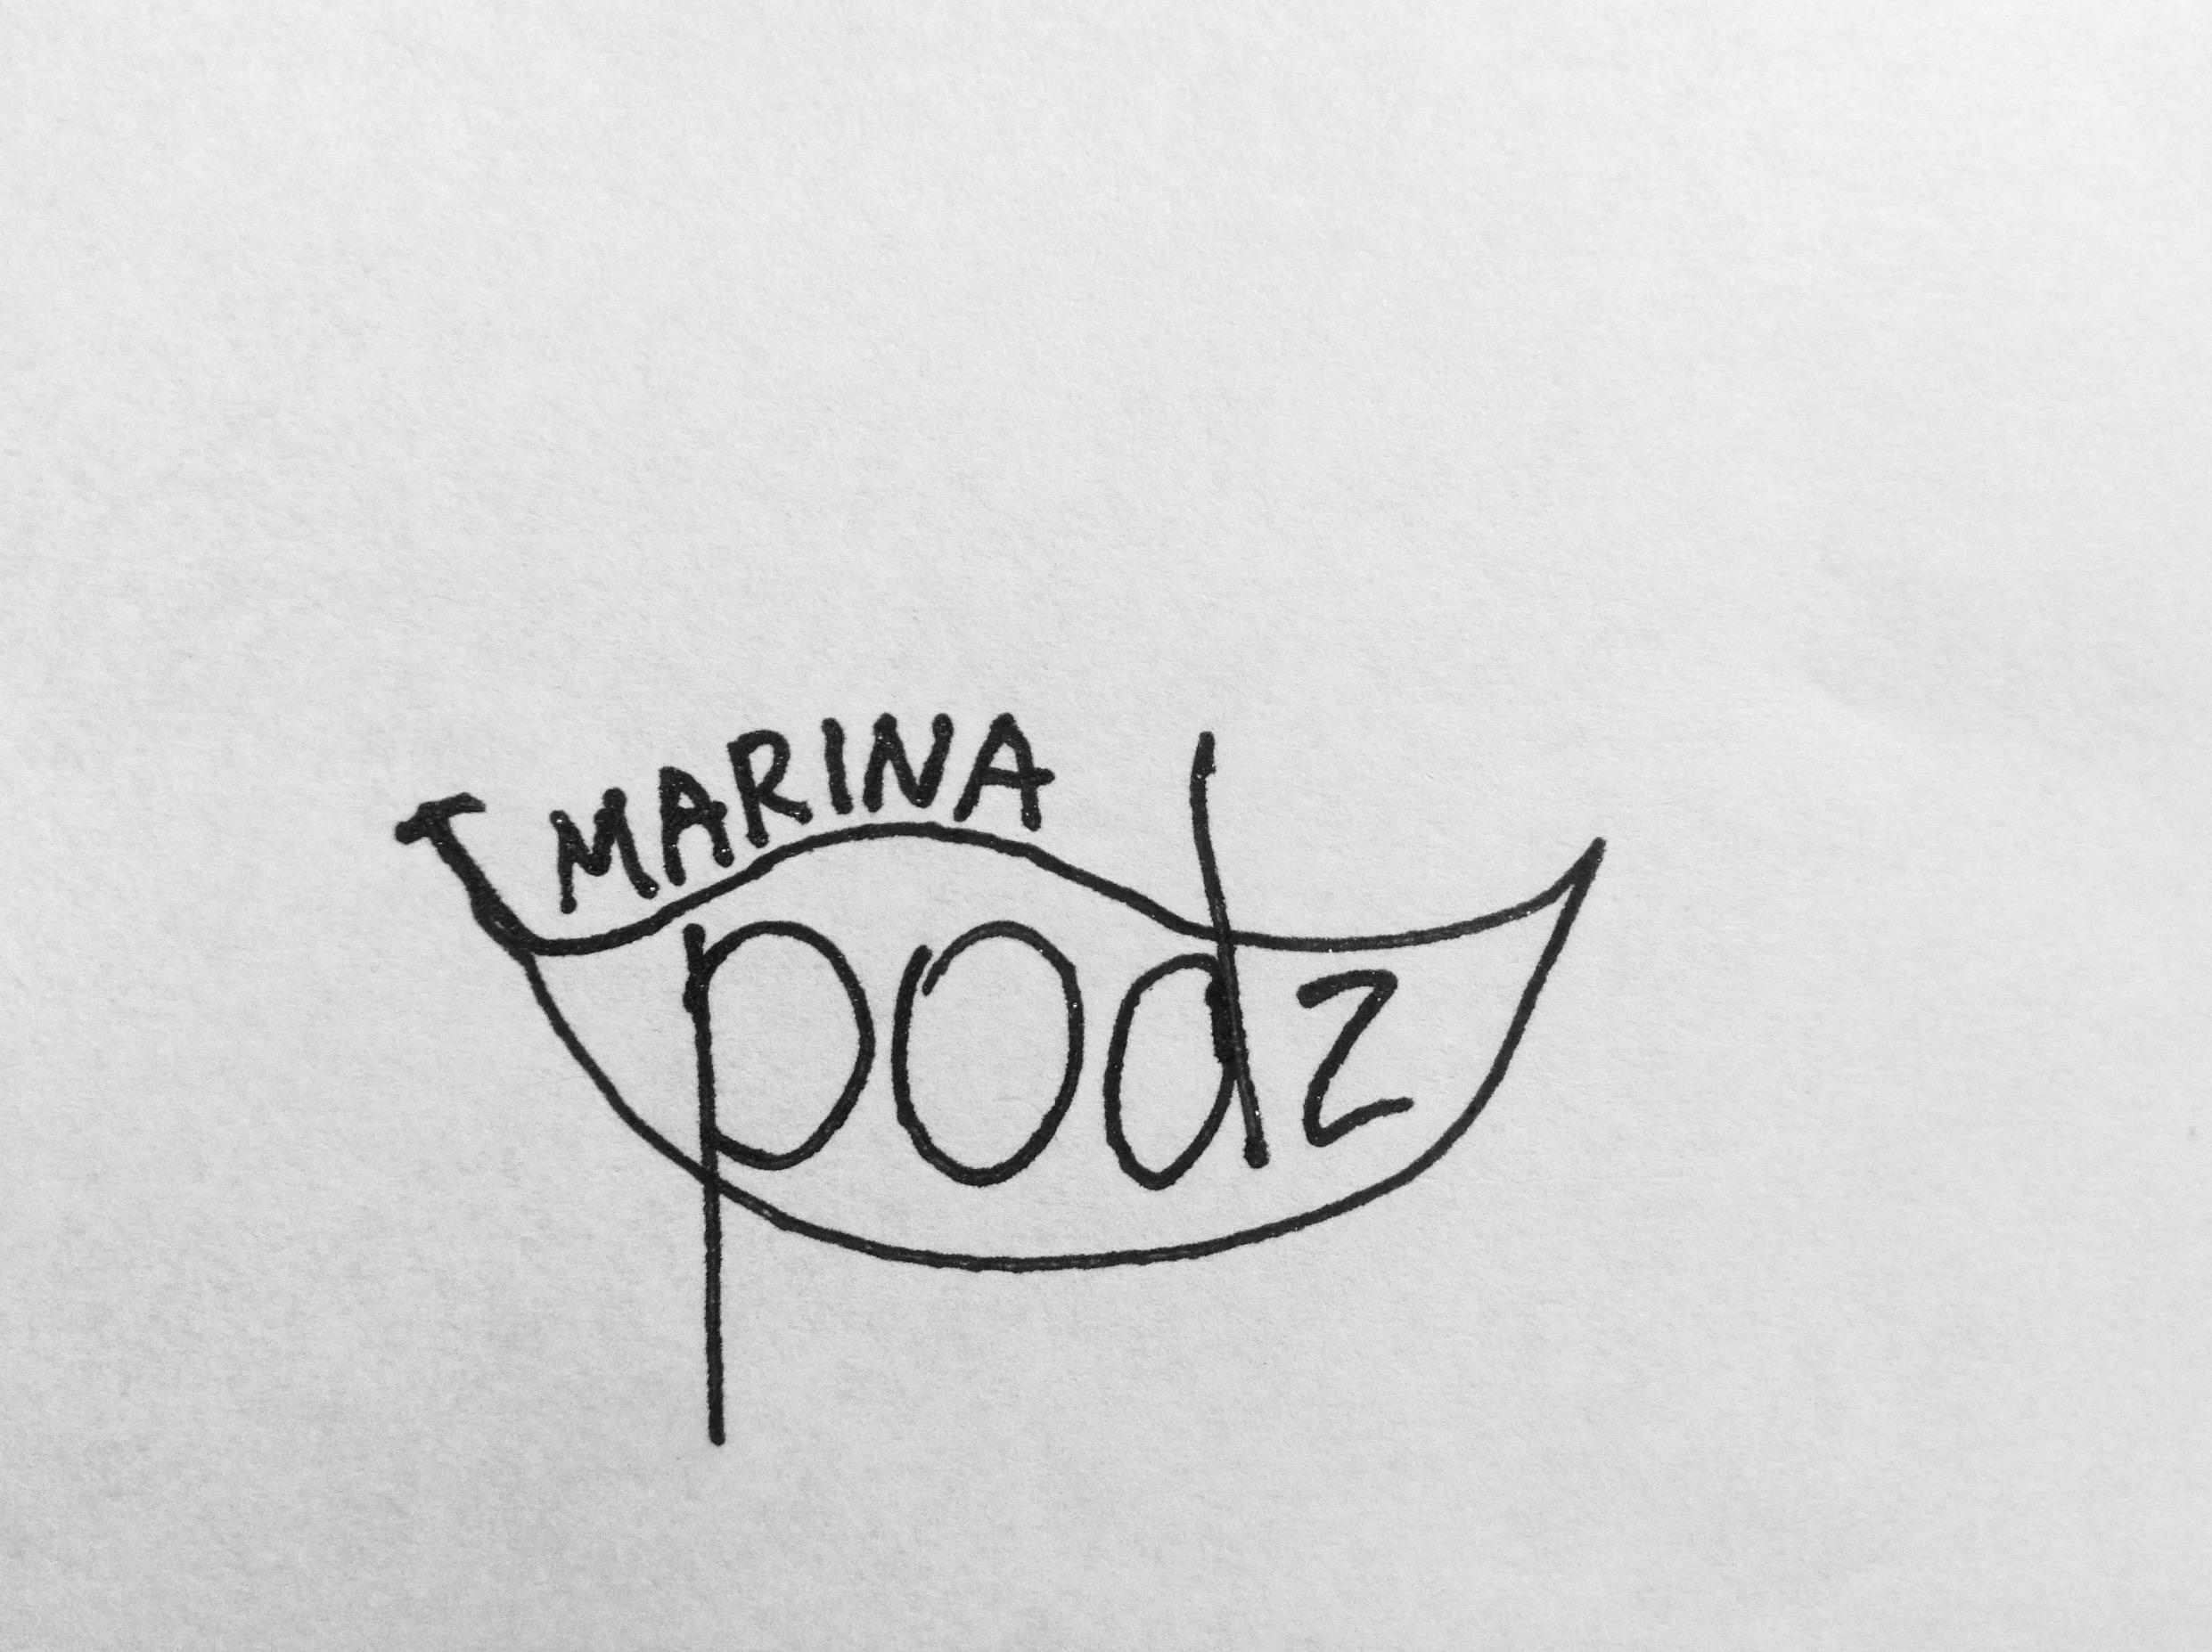 Marina Podzorova Signature